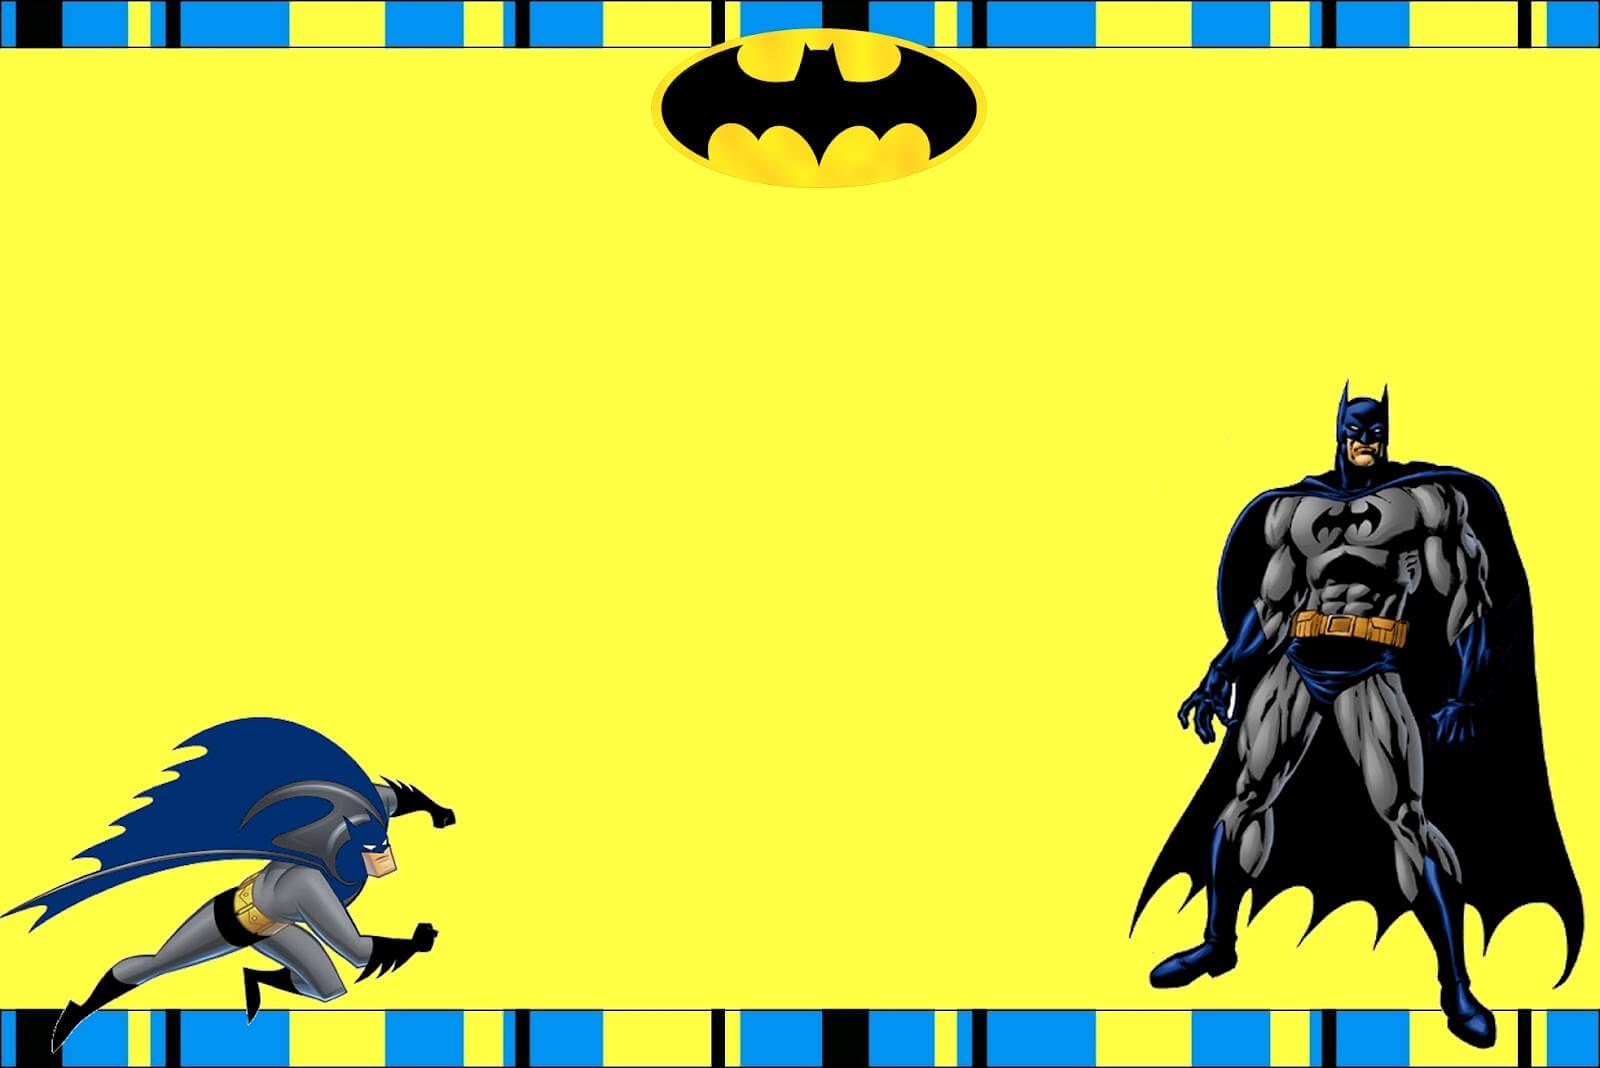 Free Printable Batman Birthday Invitations With Batman Birthday Card Template